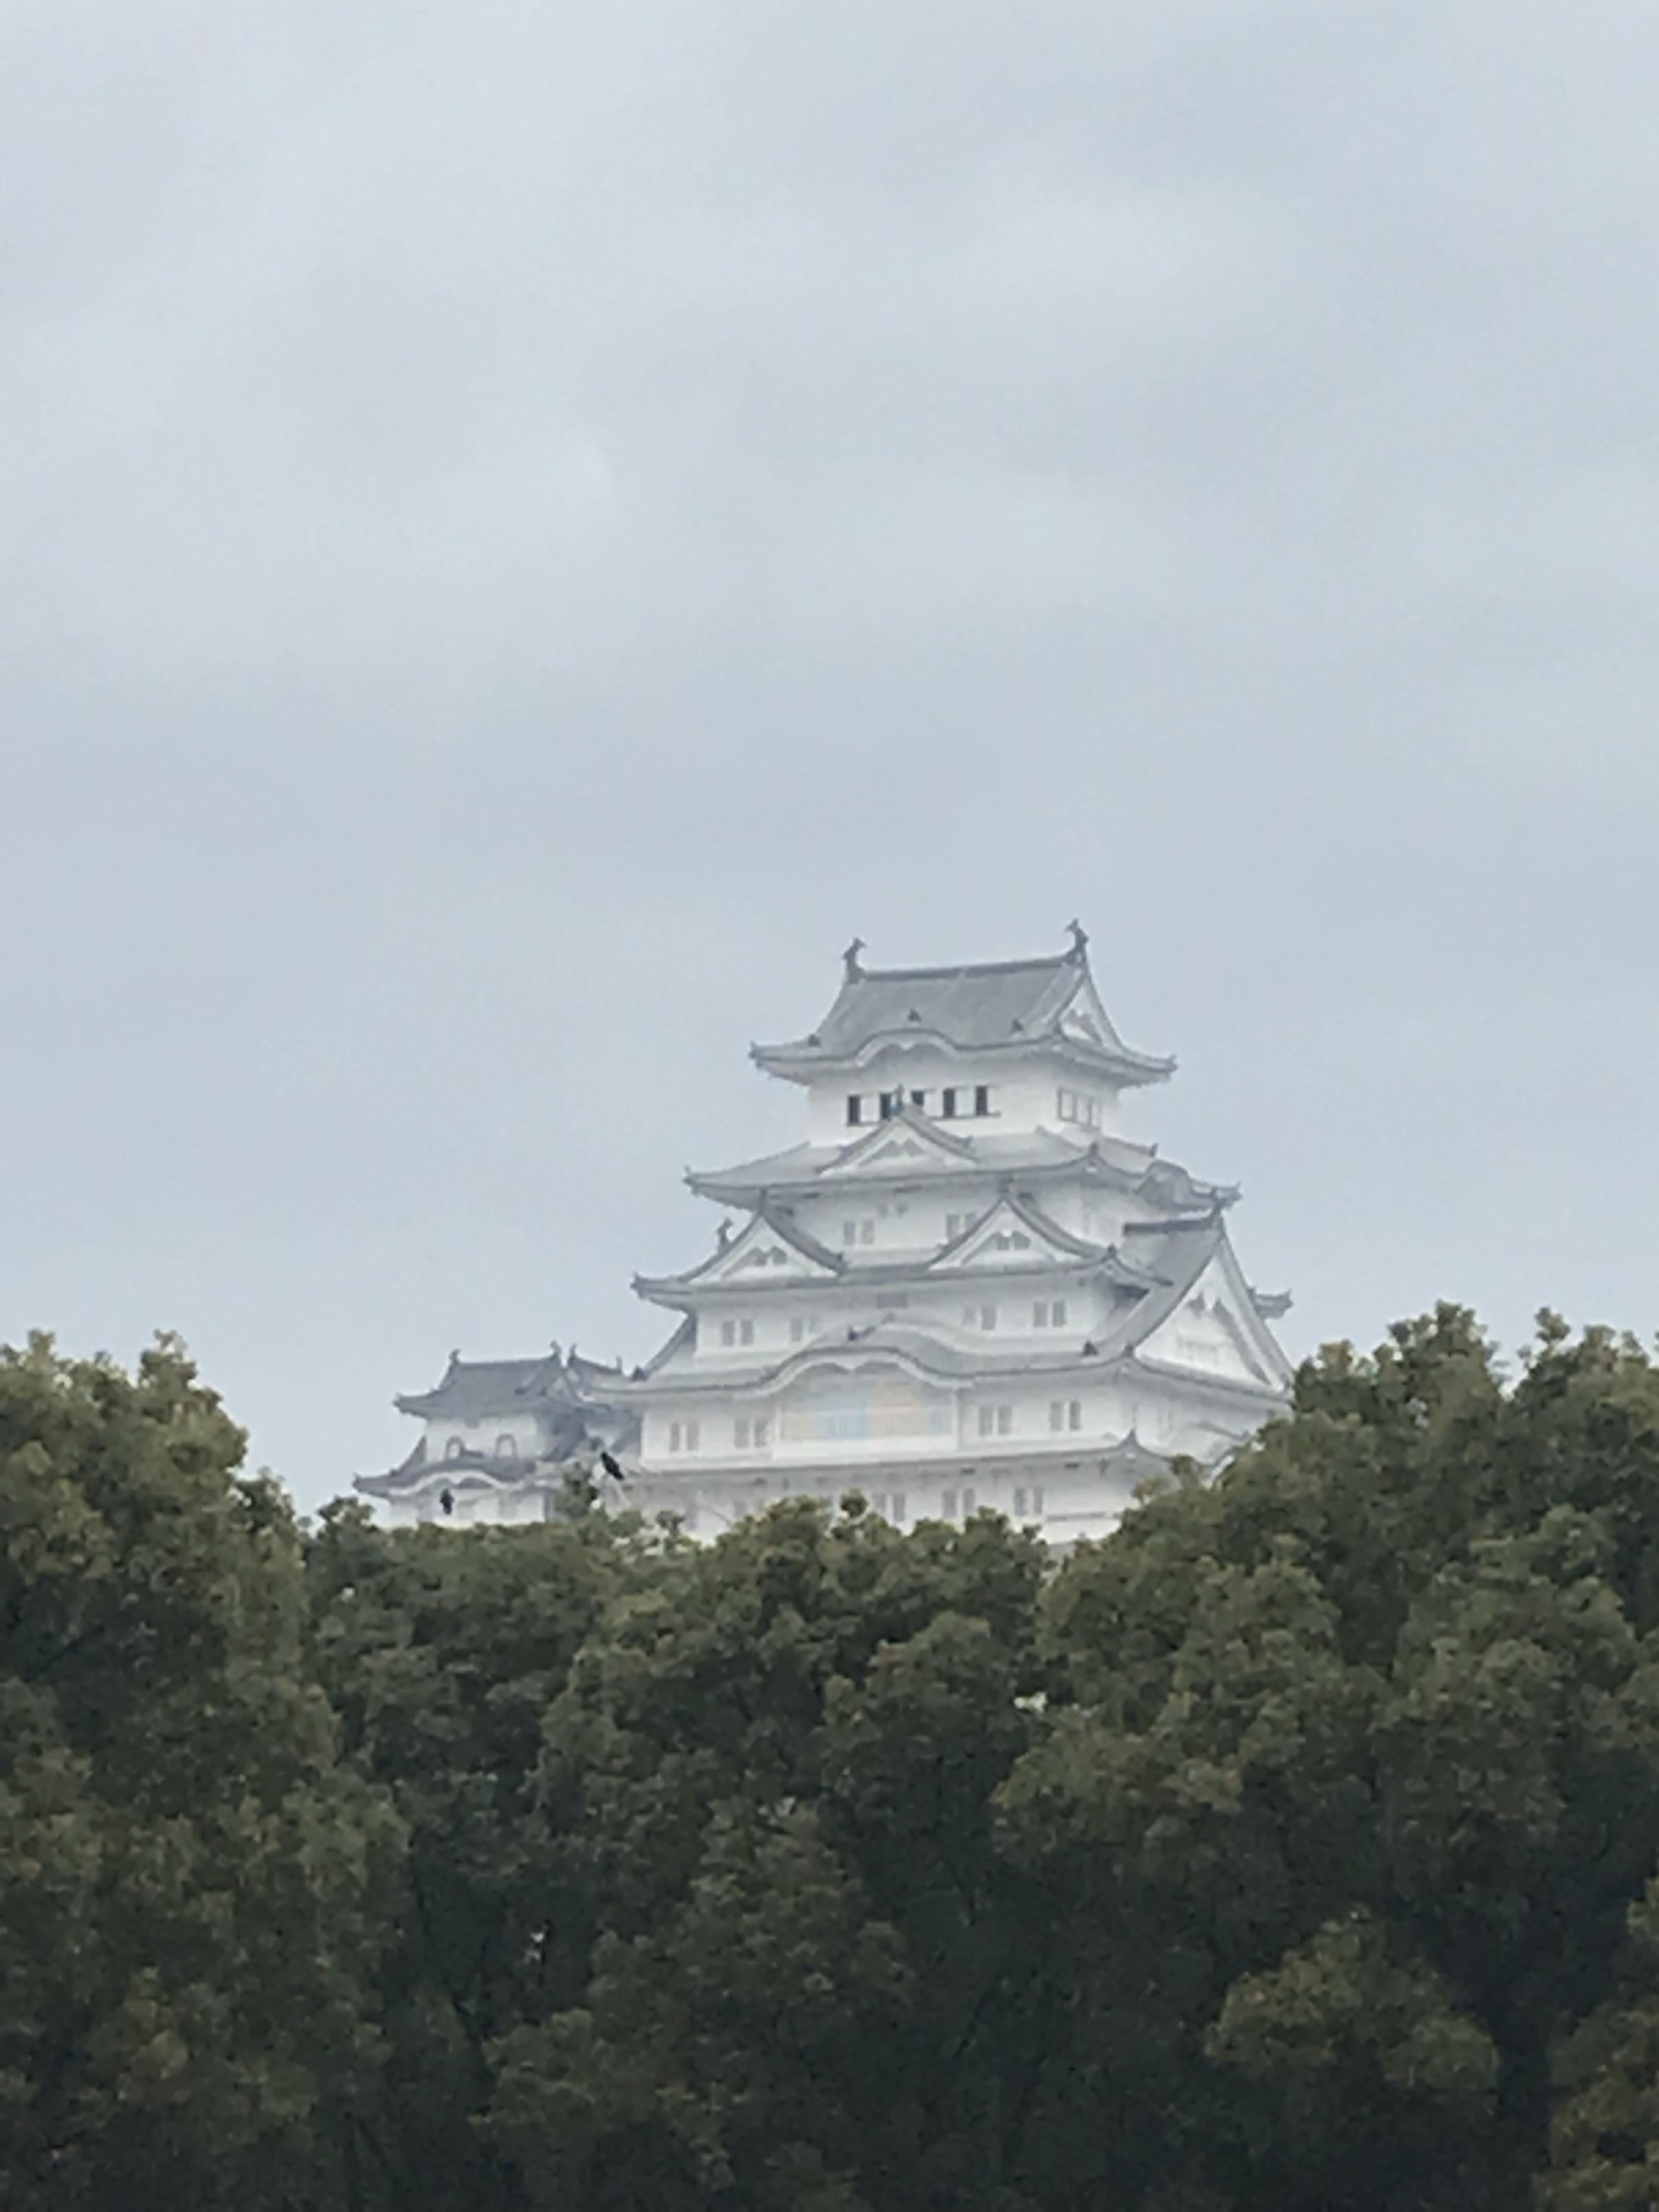 ARアプリも楽しめる国宝姫路城、動物園も併設@兵庫